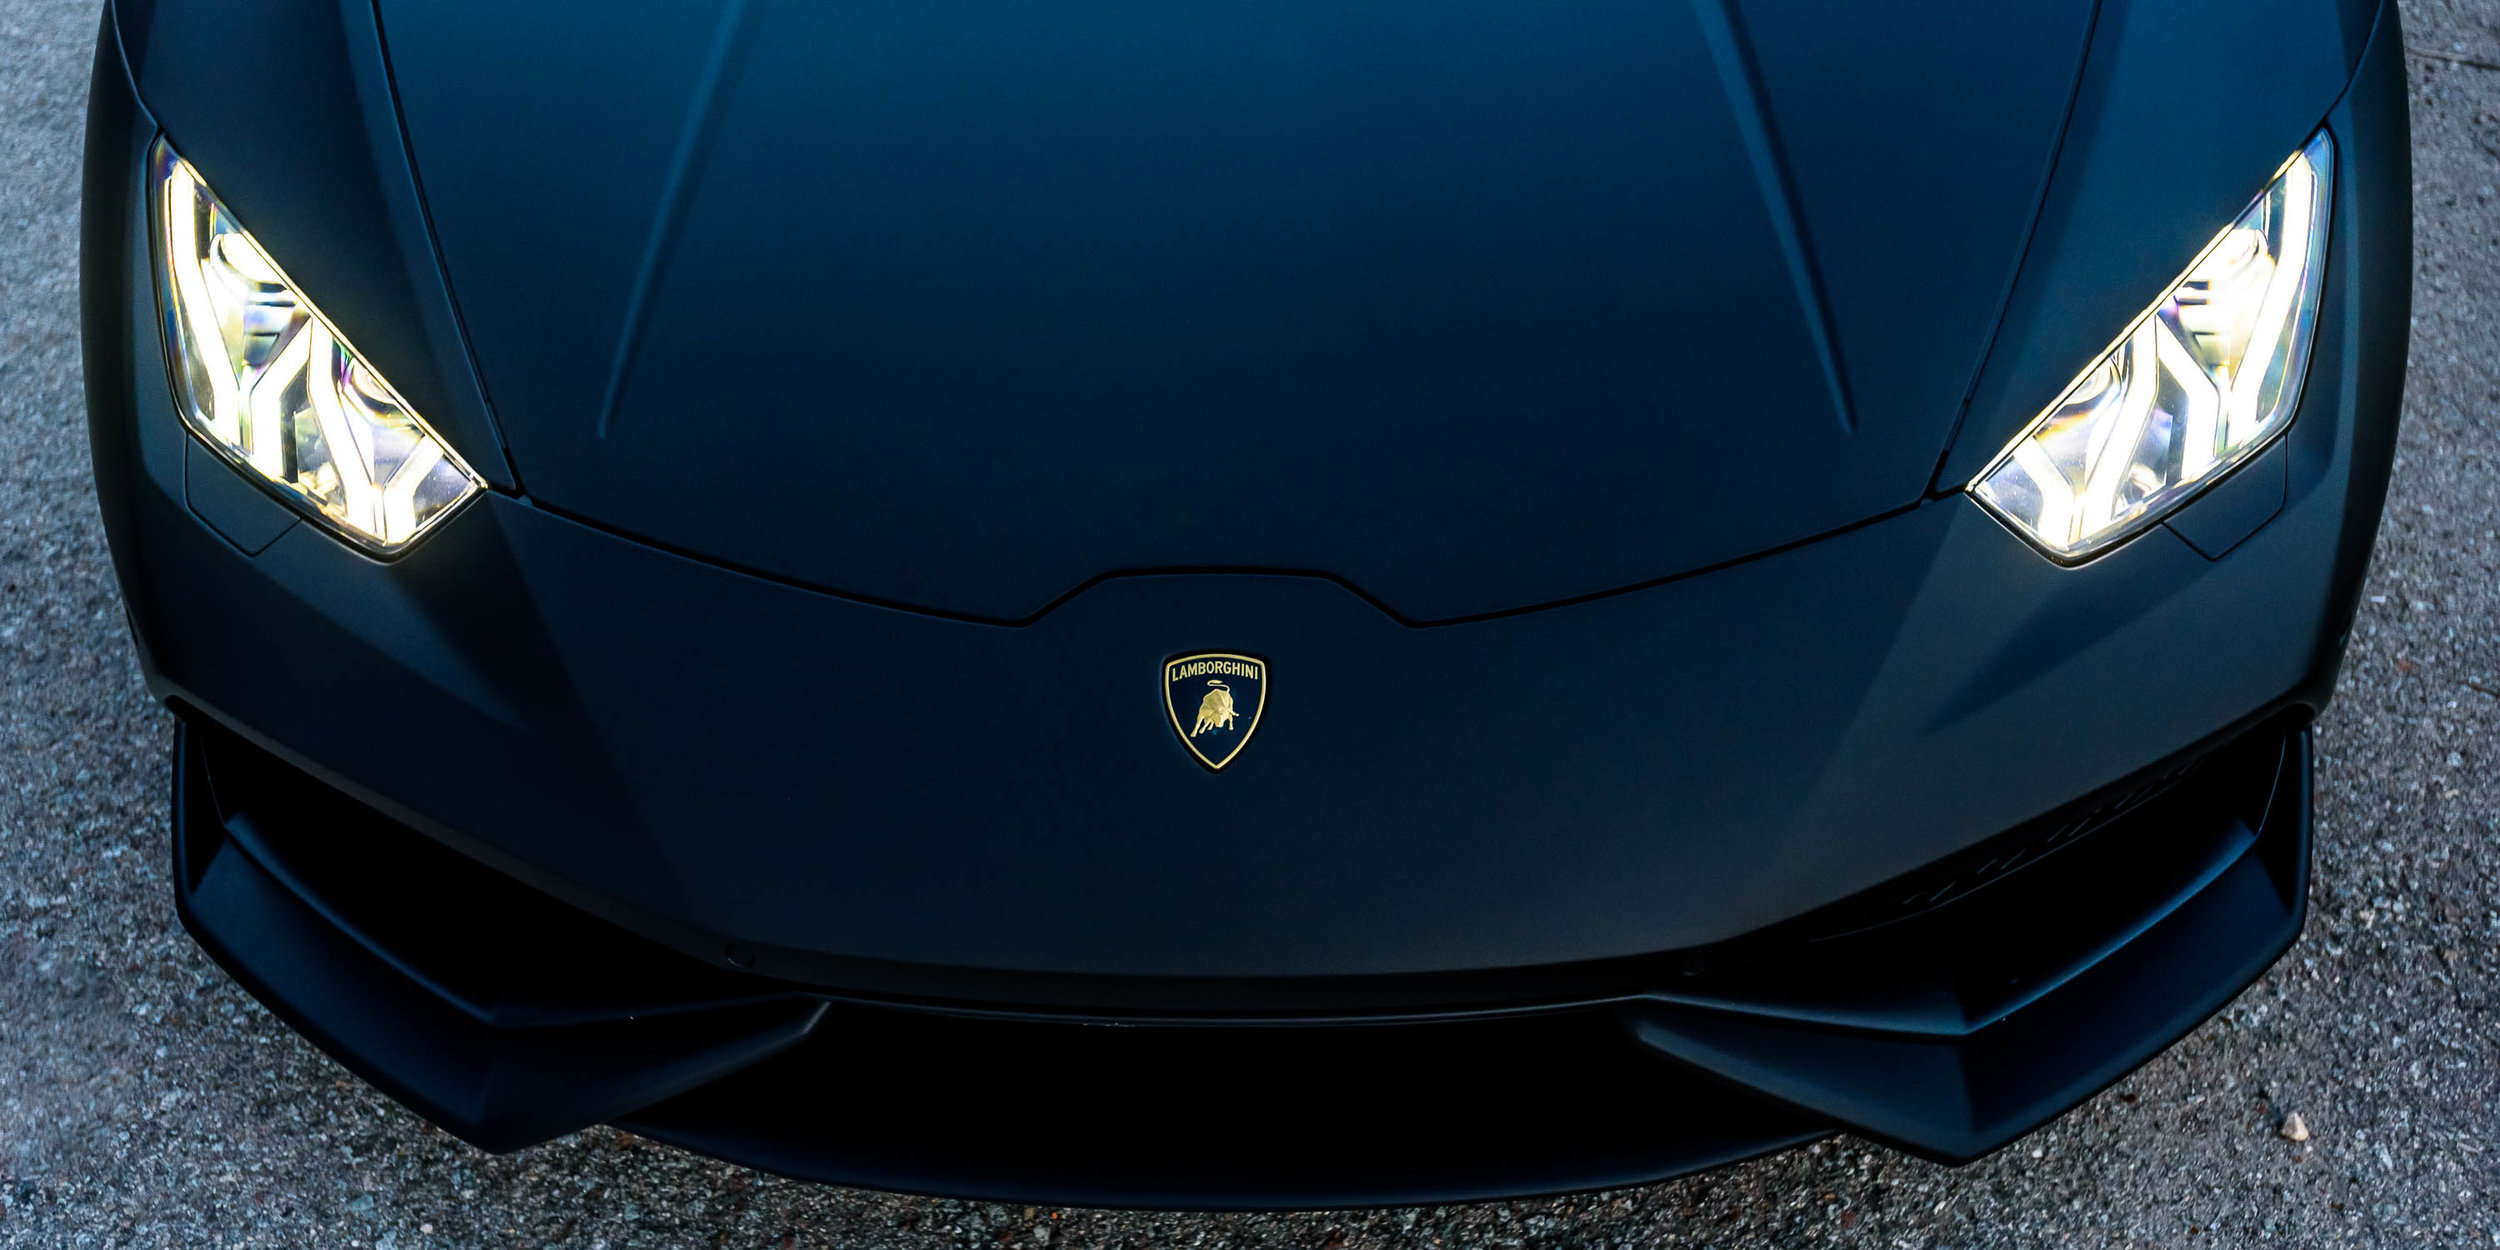 Lamborghini HURACAN Vinyl Customs-Fotos de tu coche by Pablo Dunas-013.jpg